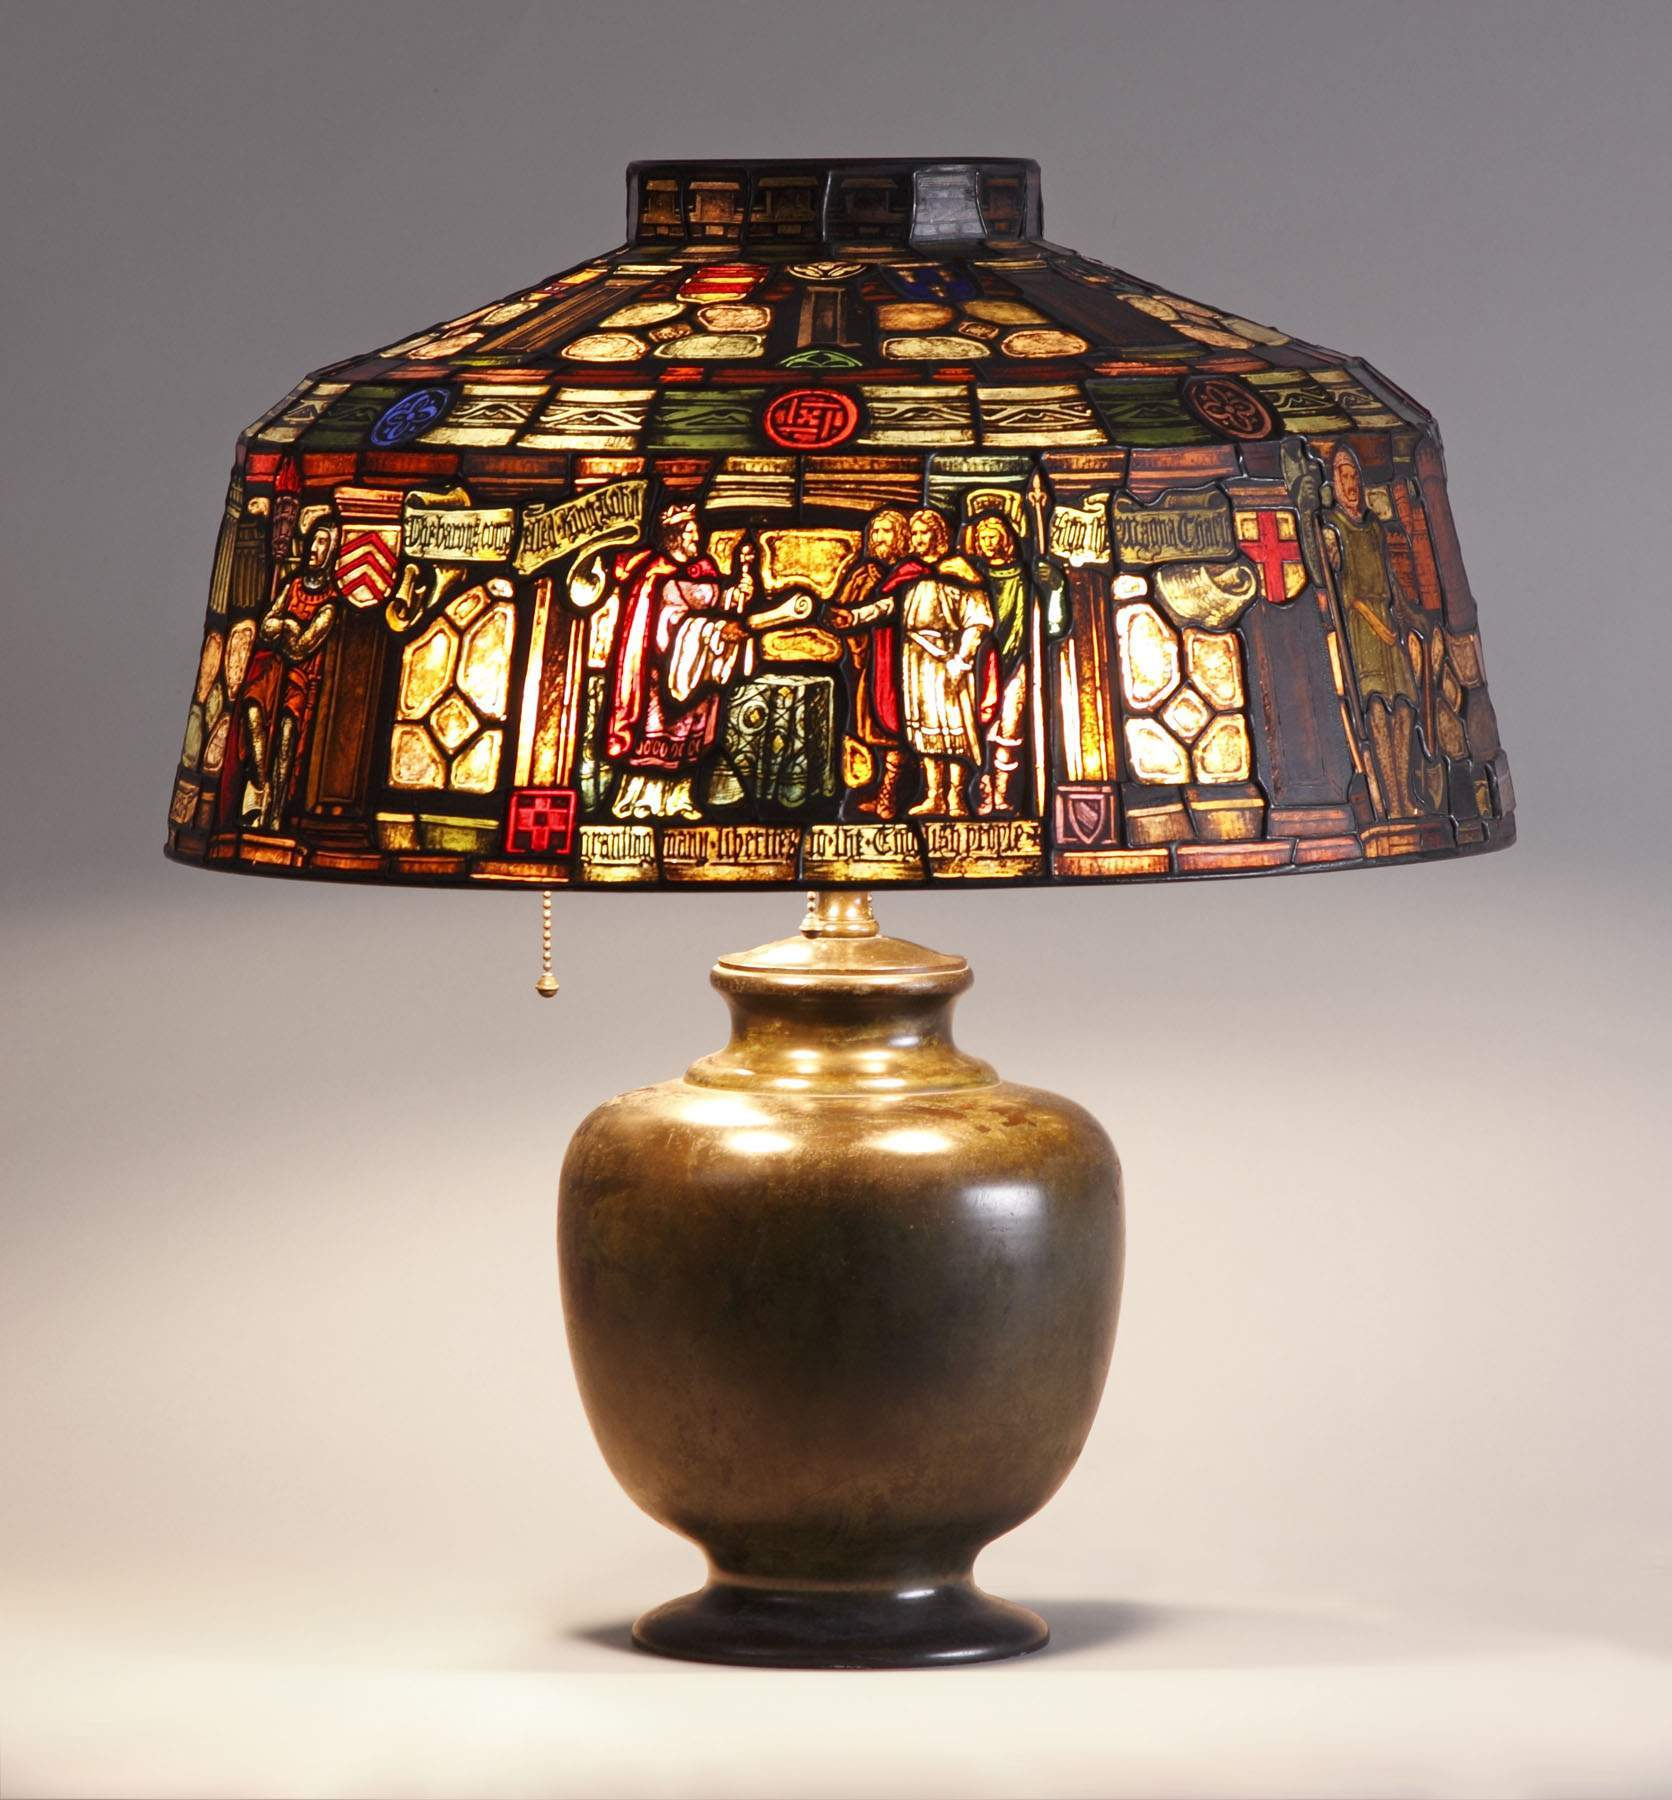 Duffner U0026 Kimberly Leaded U0026 Stained Glass Lamp, Depicting Magna Carta